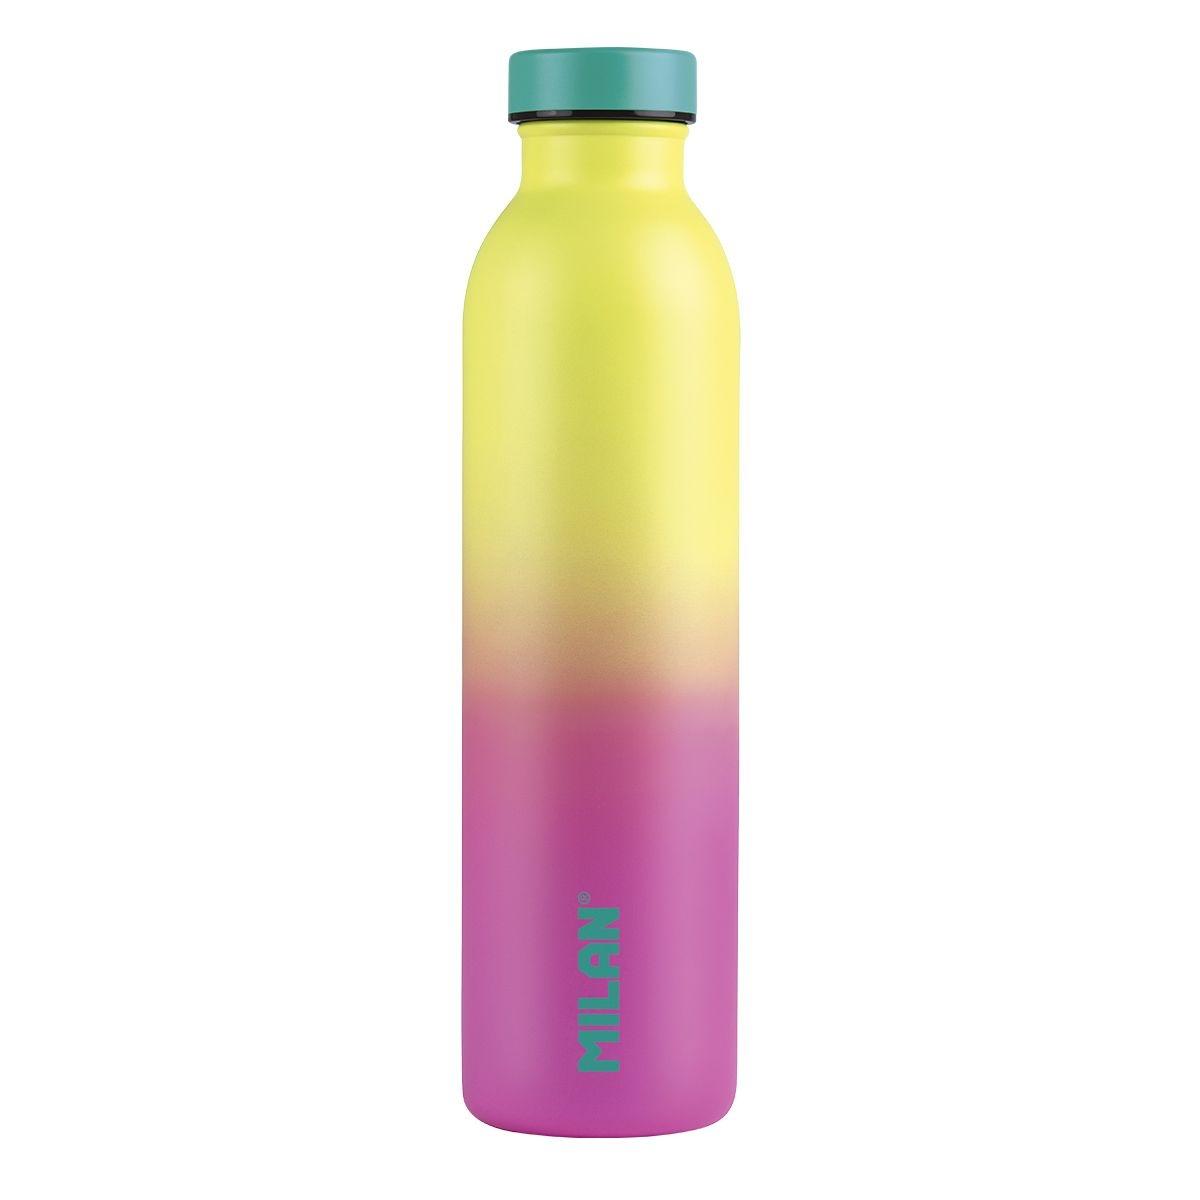 Butelka termiczna 591 ml Milan Sunset - żółto-różowa (643020SN)